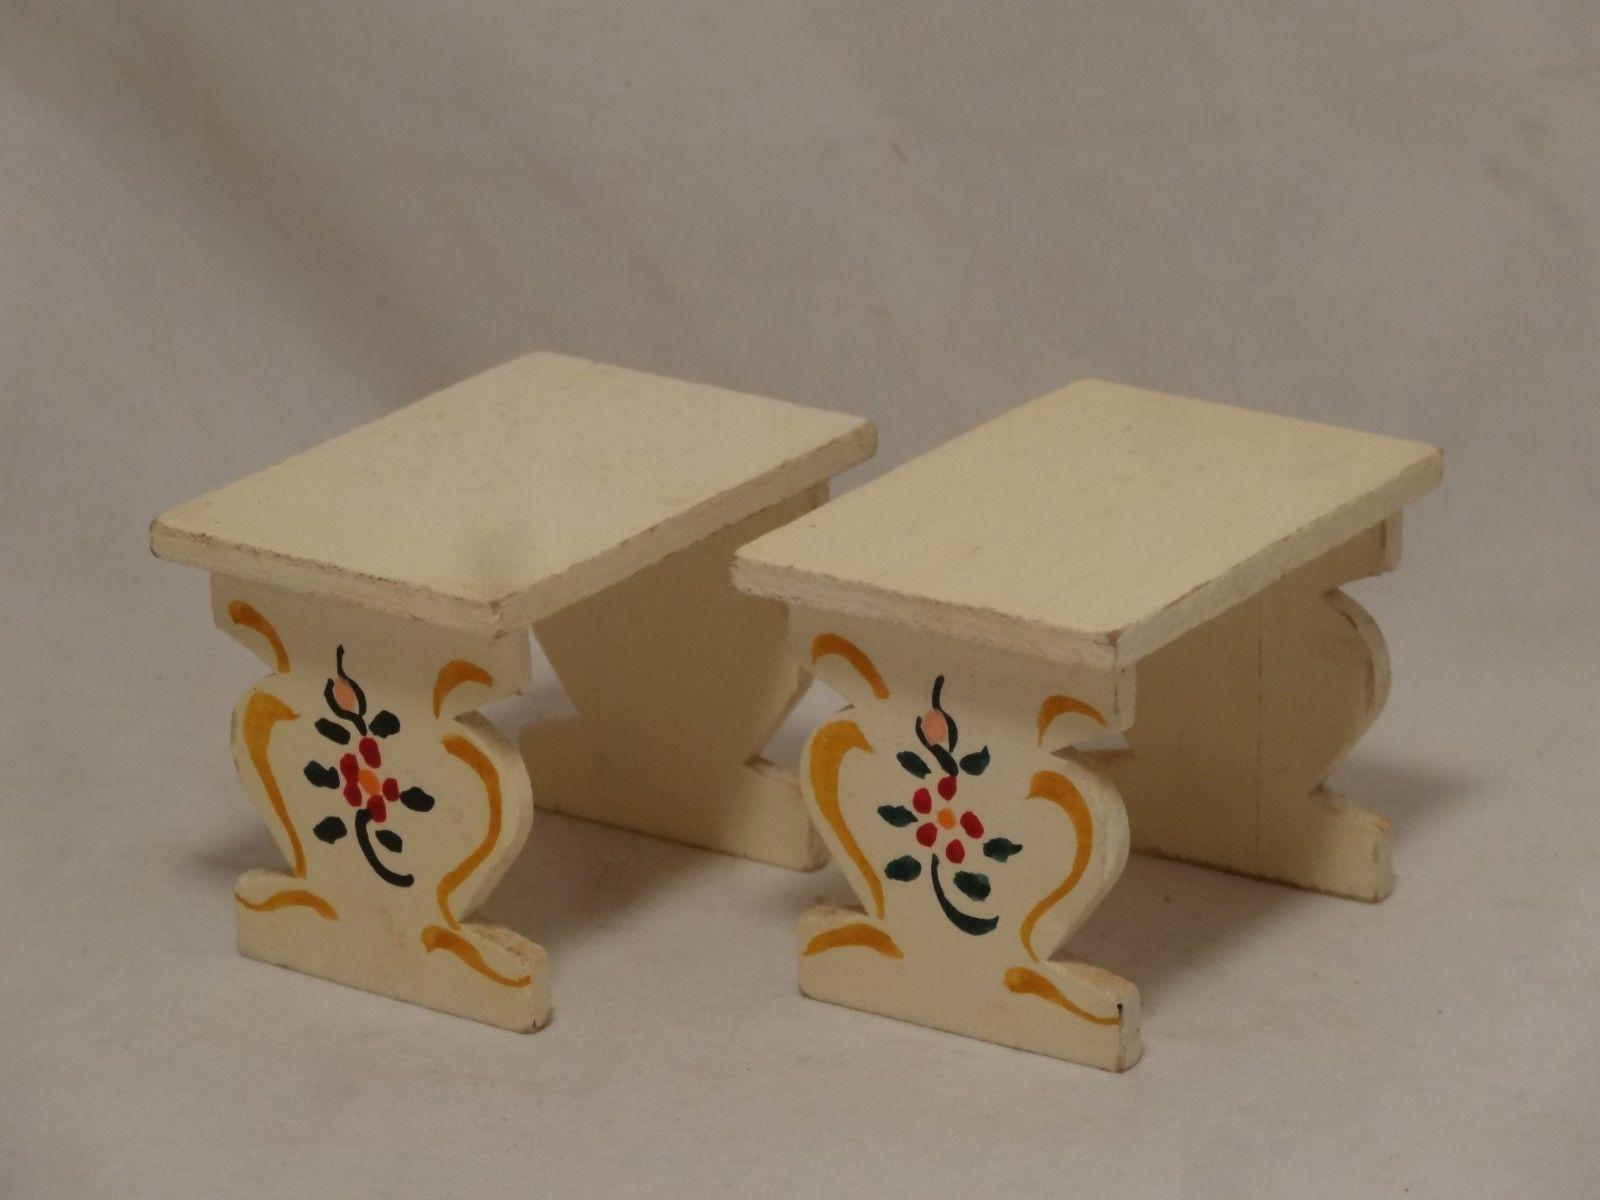 Dora Kuhn (Rare) Kitchen table benches- Vintage German Dollhouse furniture   eBay